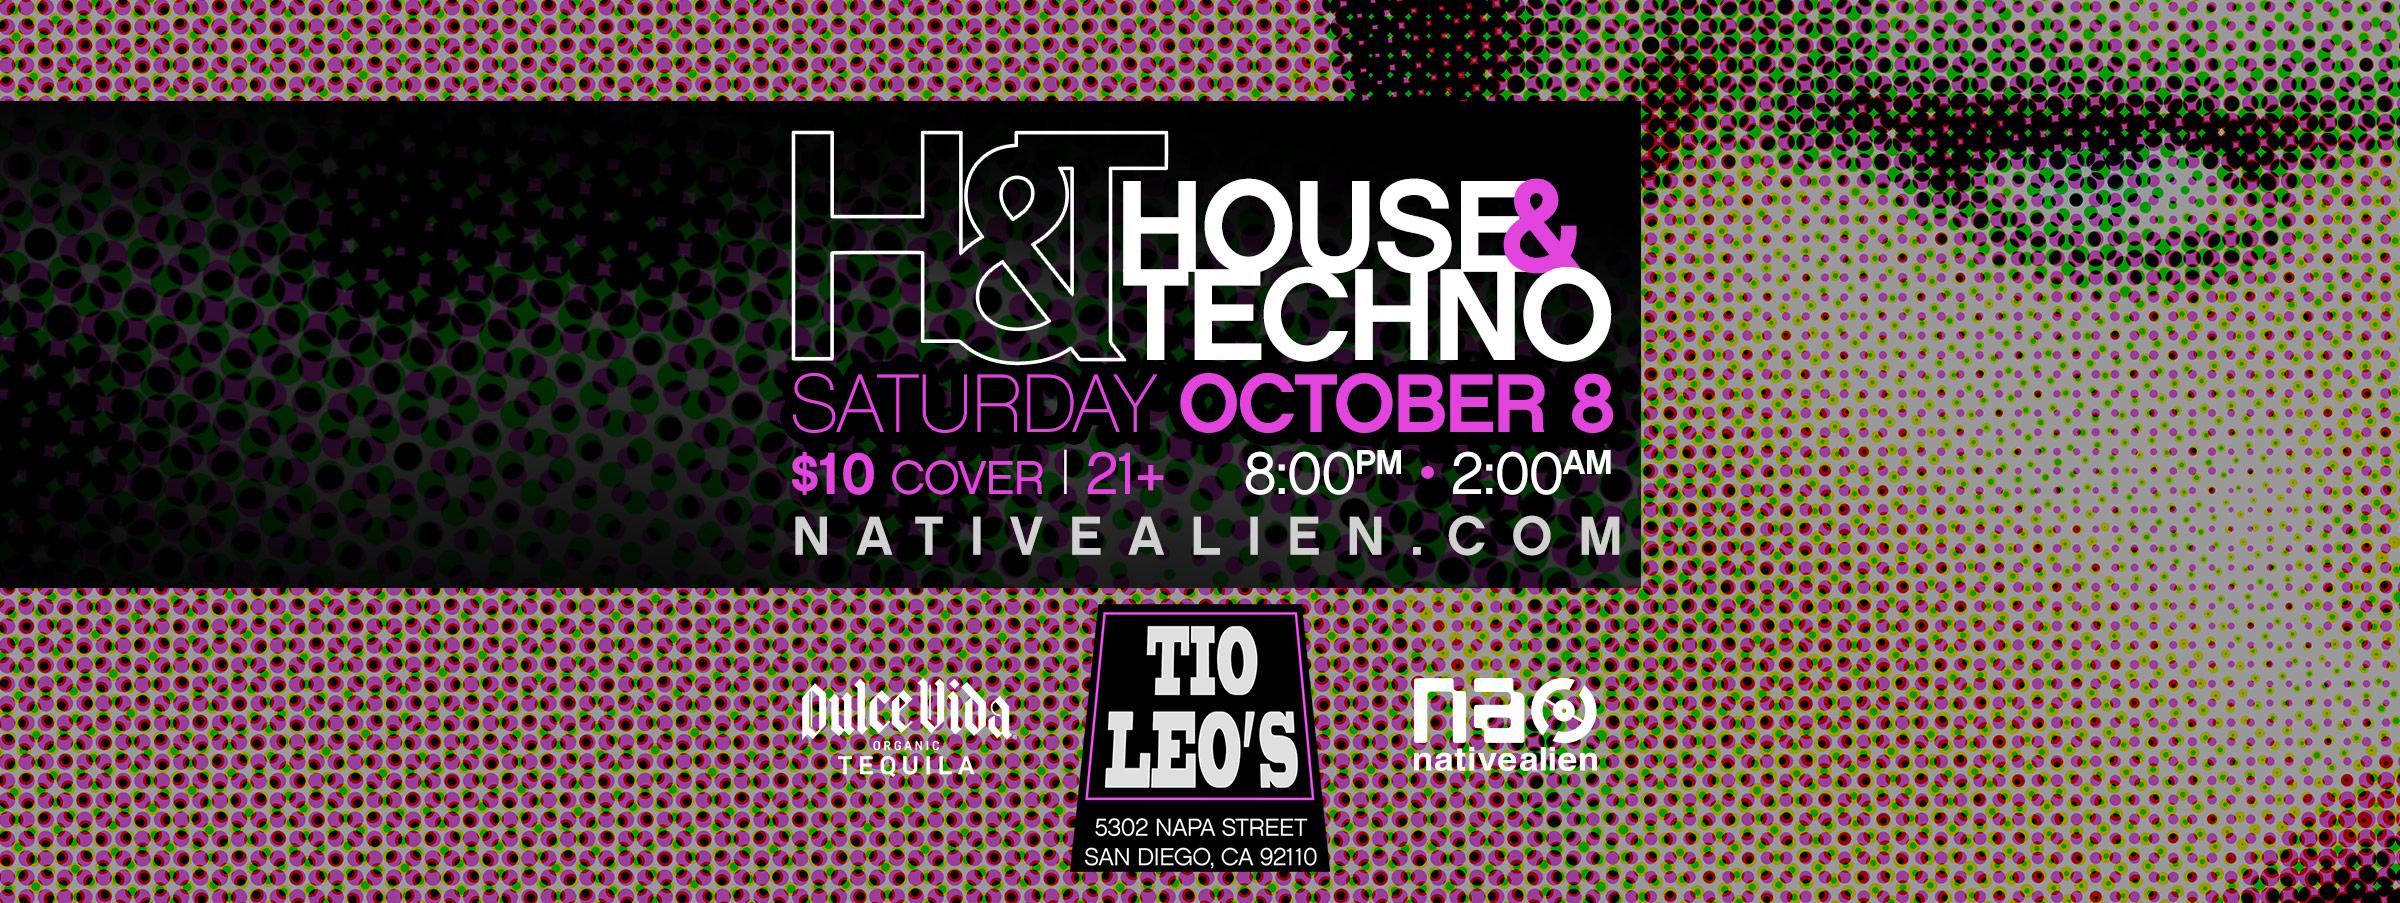 House & Techno - October 8